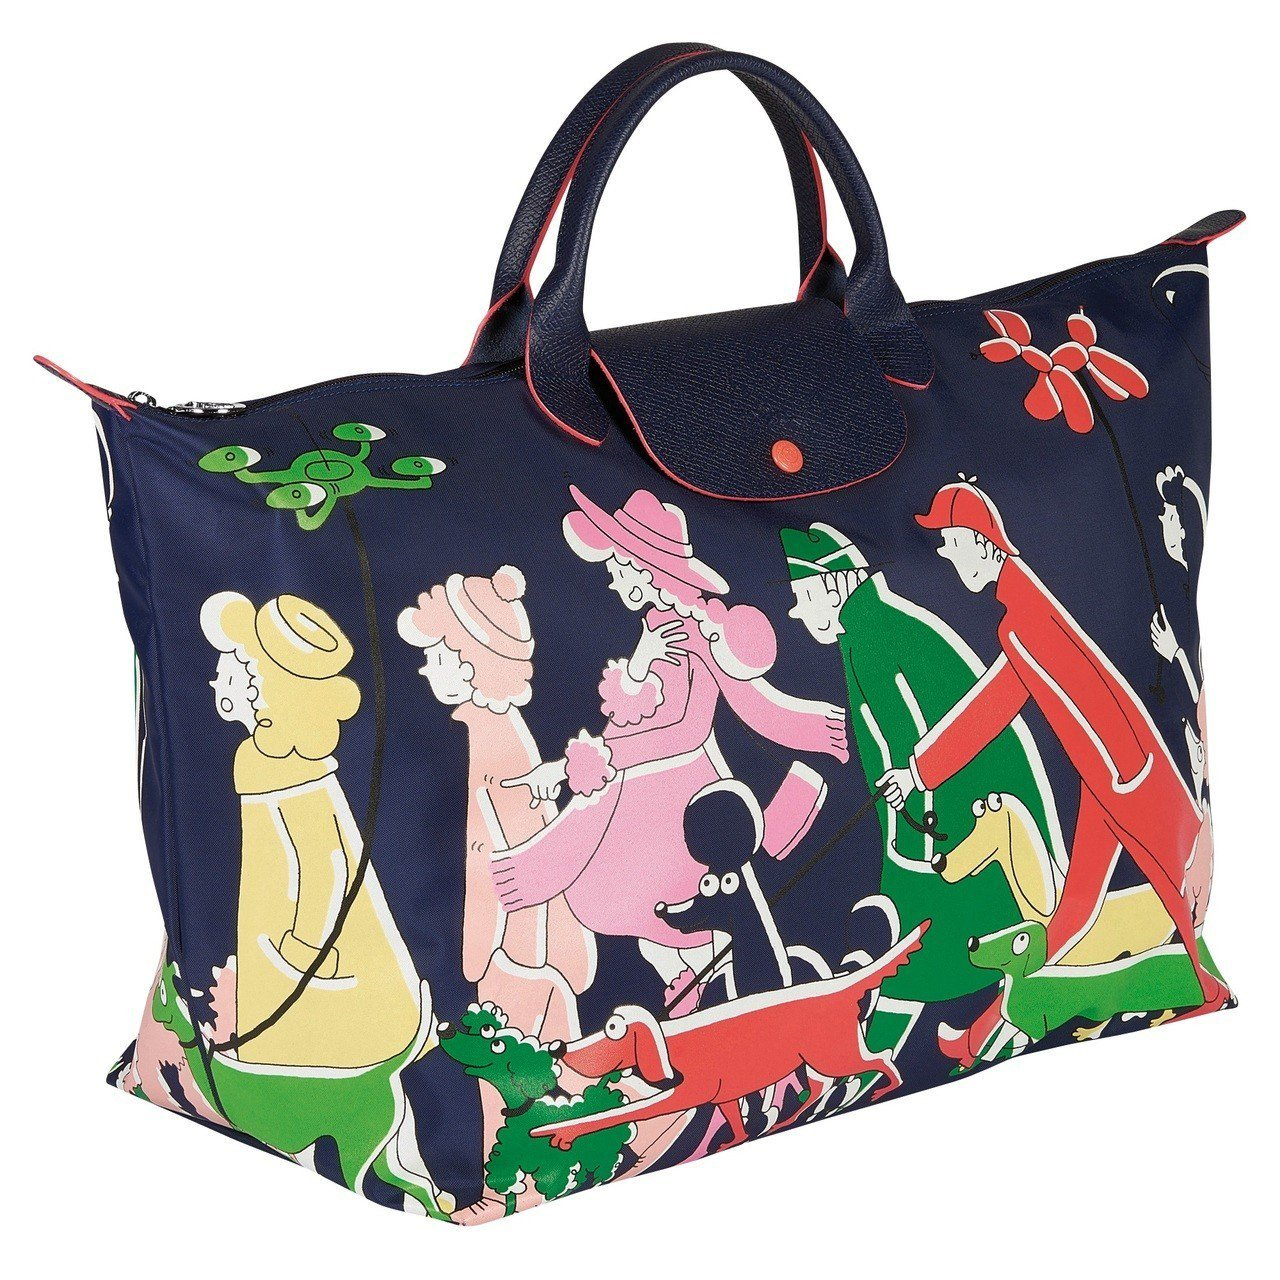 LONGCHAMP x Clo'e Floirat旅行袋,售價10,600元。圖...